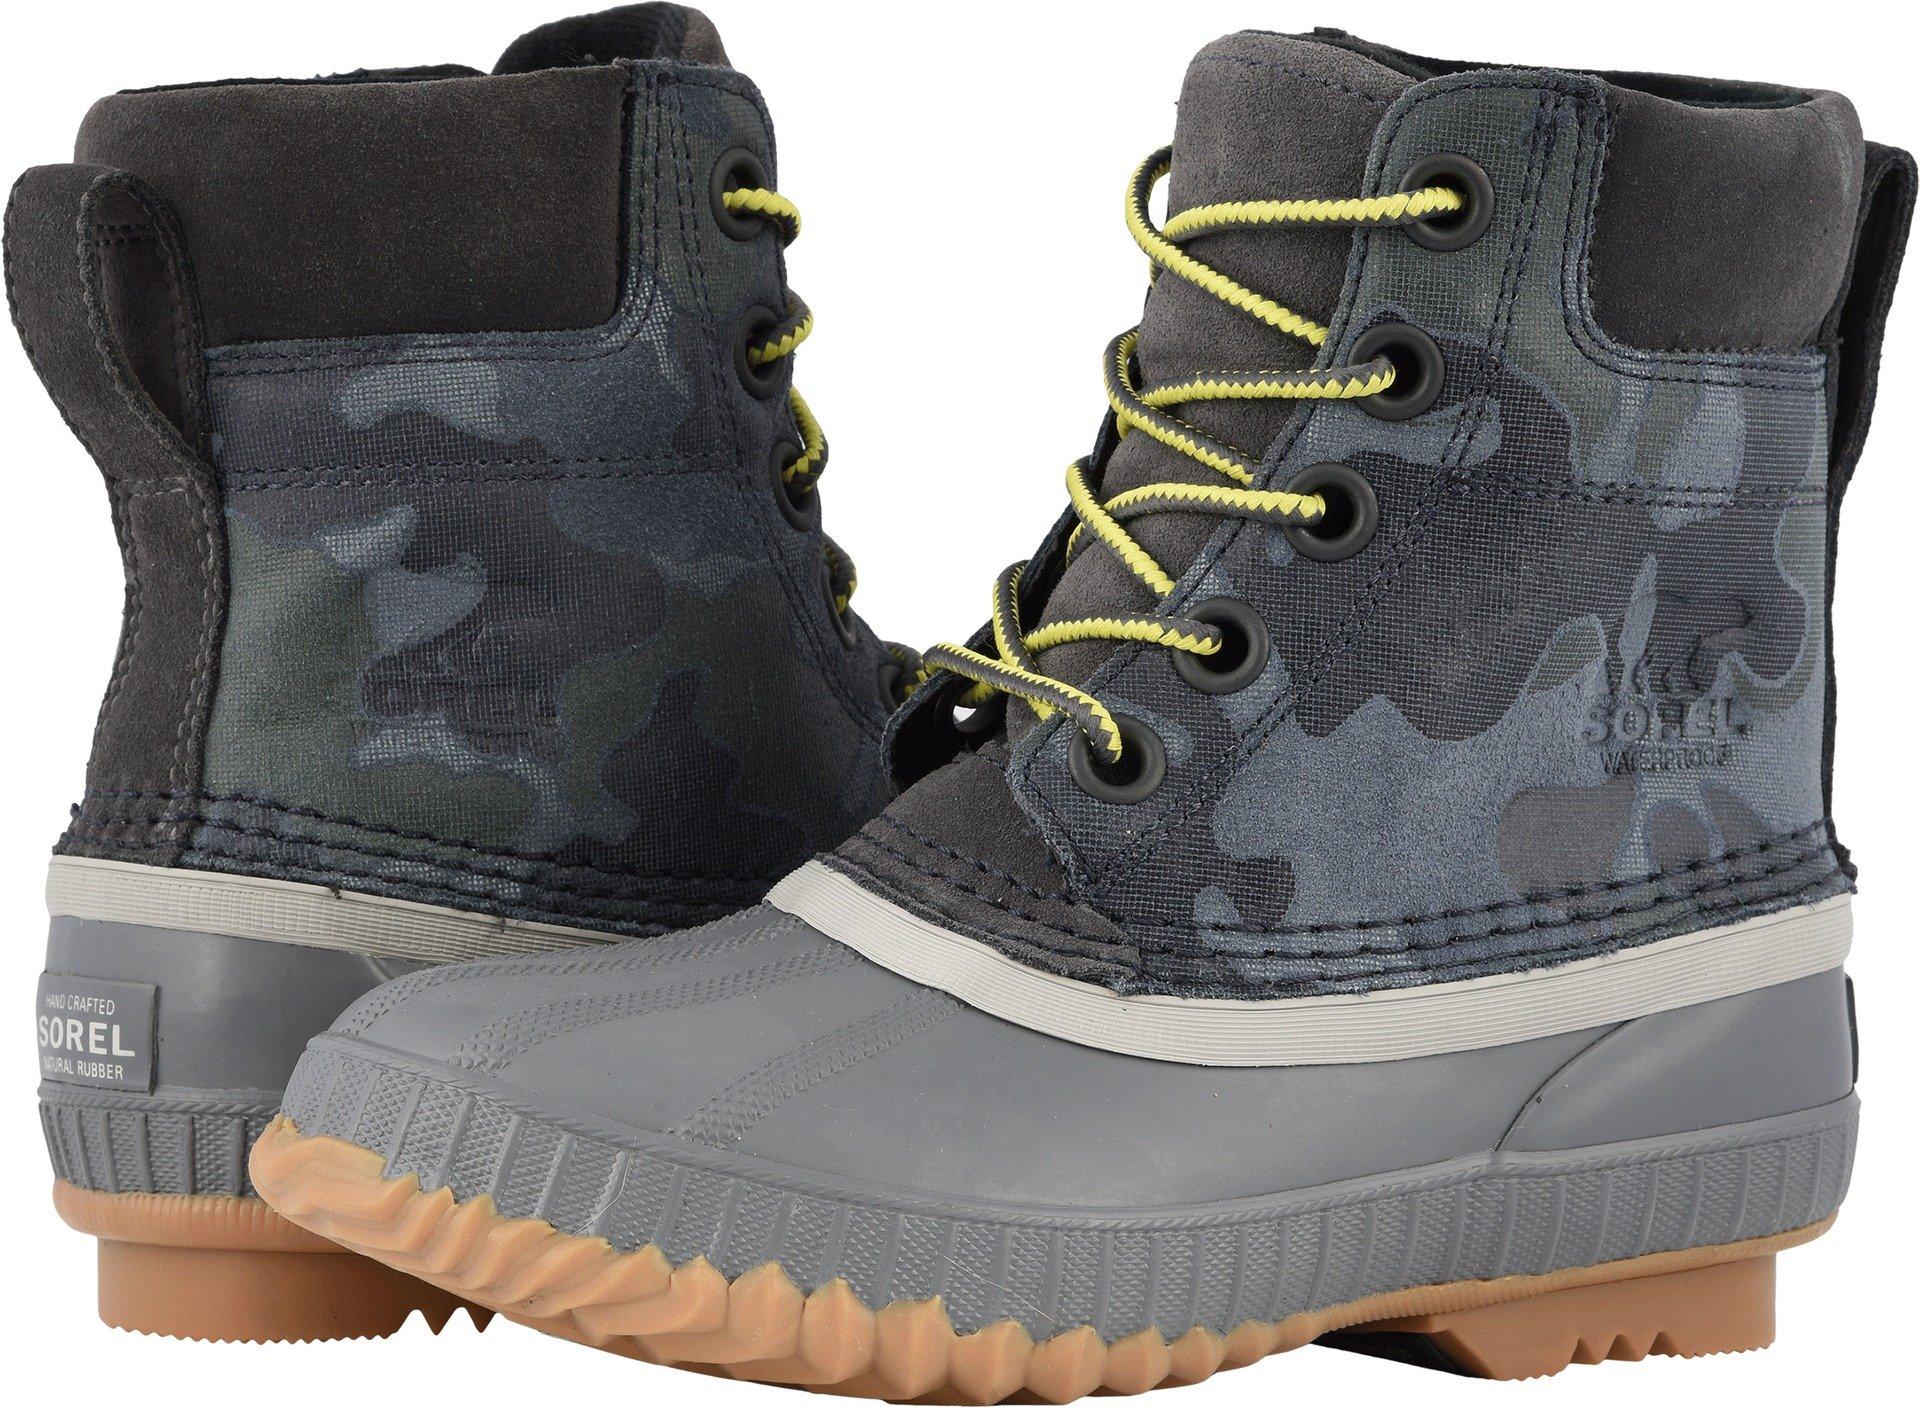 SOREL Boys' Youth Cheyanne II Lace Chukka Boot, Dark Grey, Dove, 6 M US Big Kid